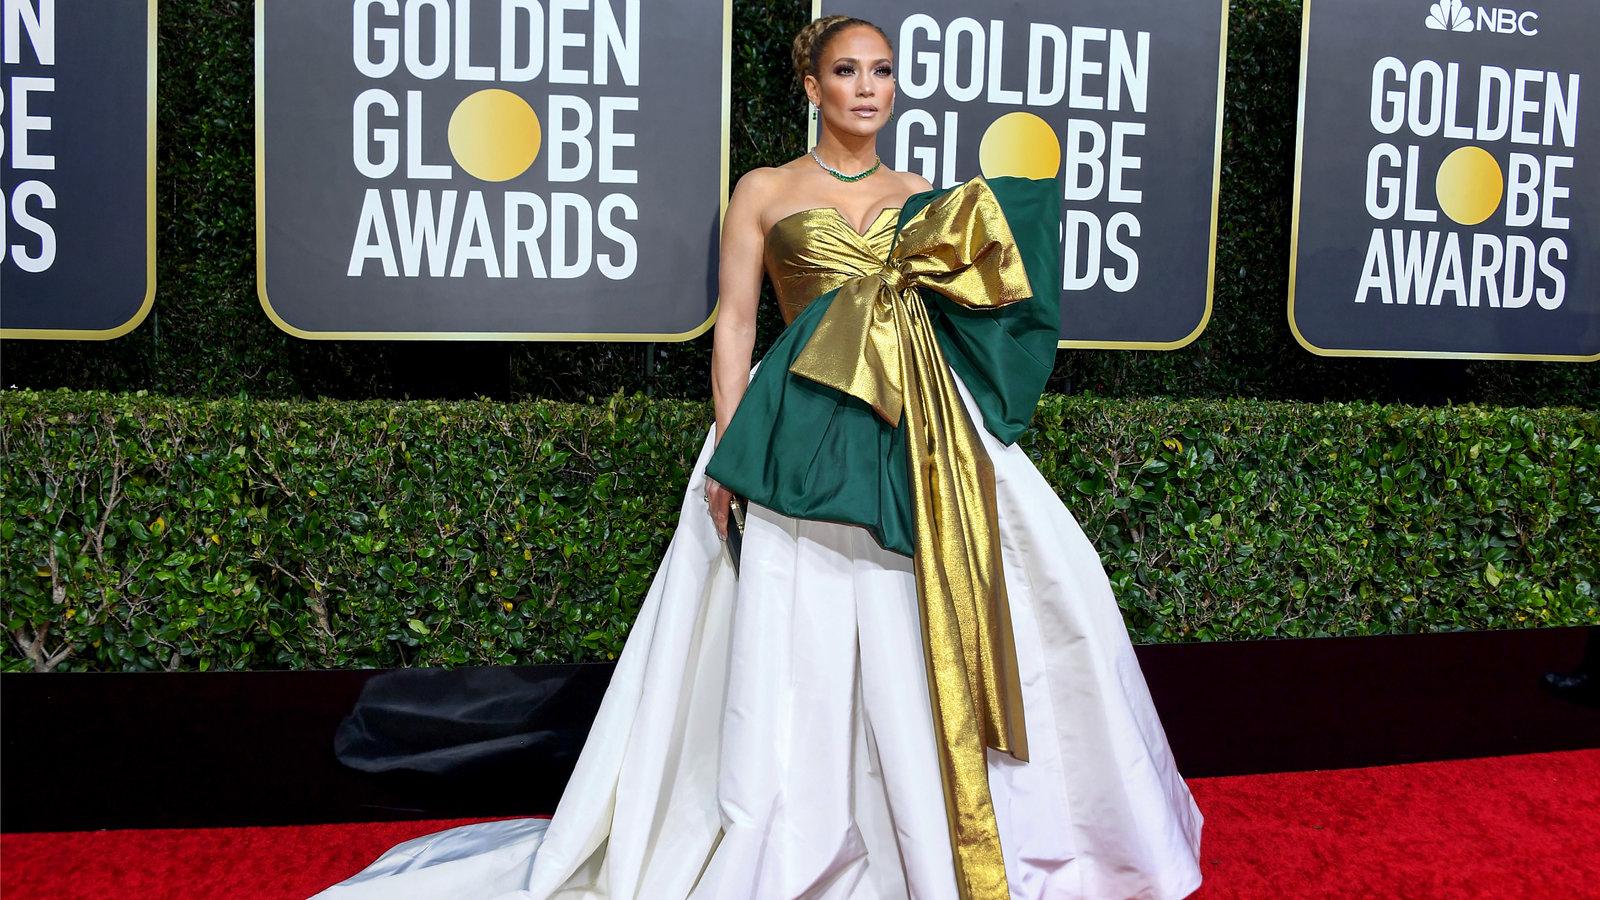 This Golden Globes Red Carpet Was Not Harvey Weinsteins Red 1600x900